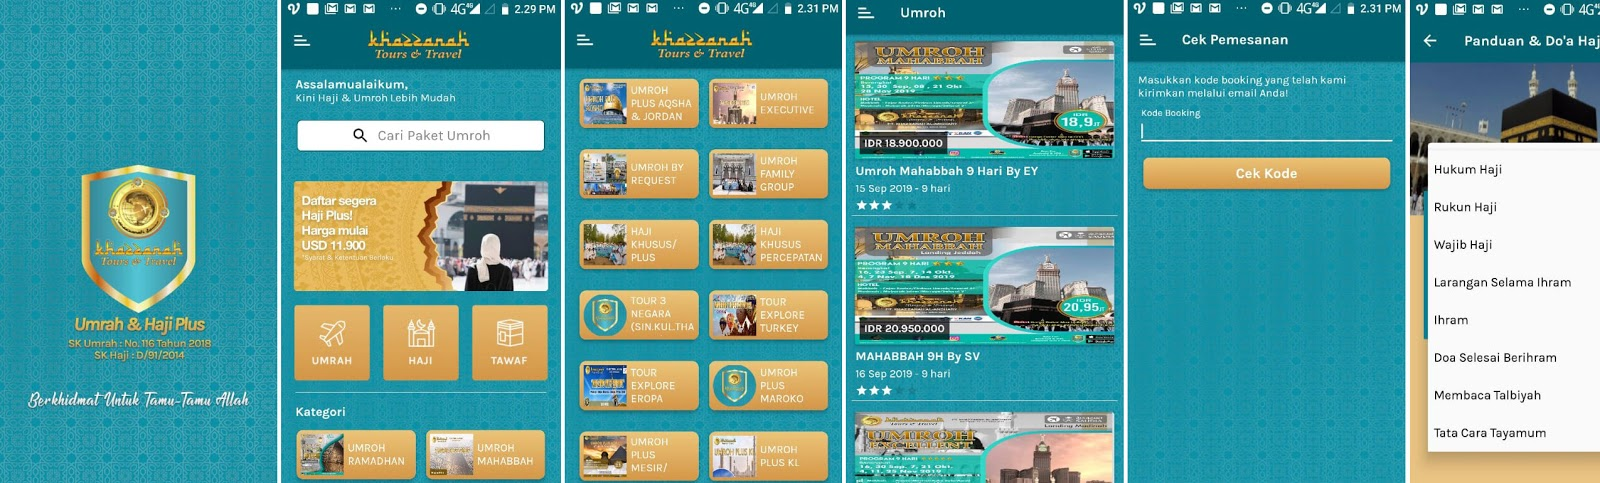 Aplikasi Khazzanah Tours